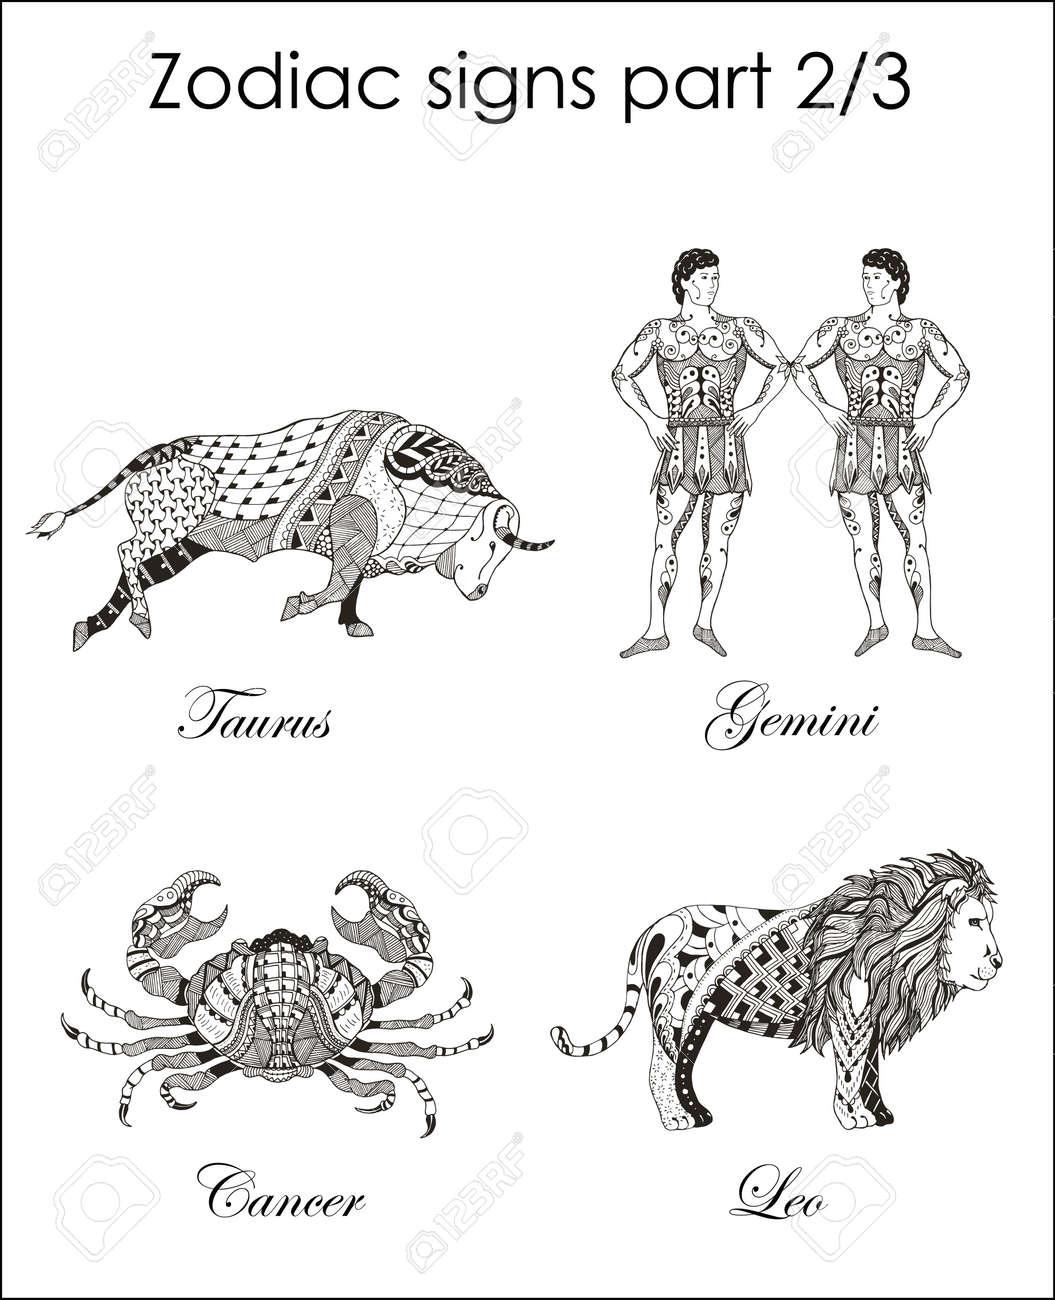 Zodiac signs taurus gemini cancer leo part two zentangle gemini cancer leo part two zentangle stylized biocorpaavc